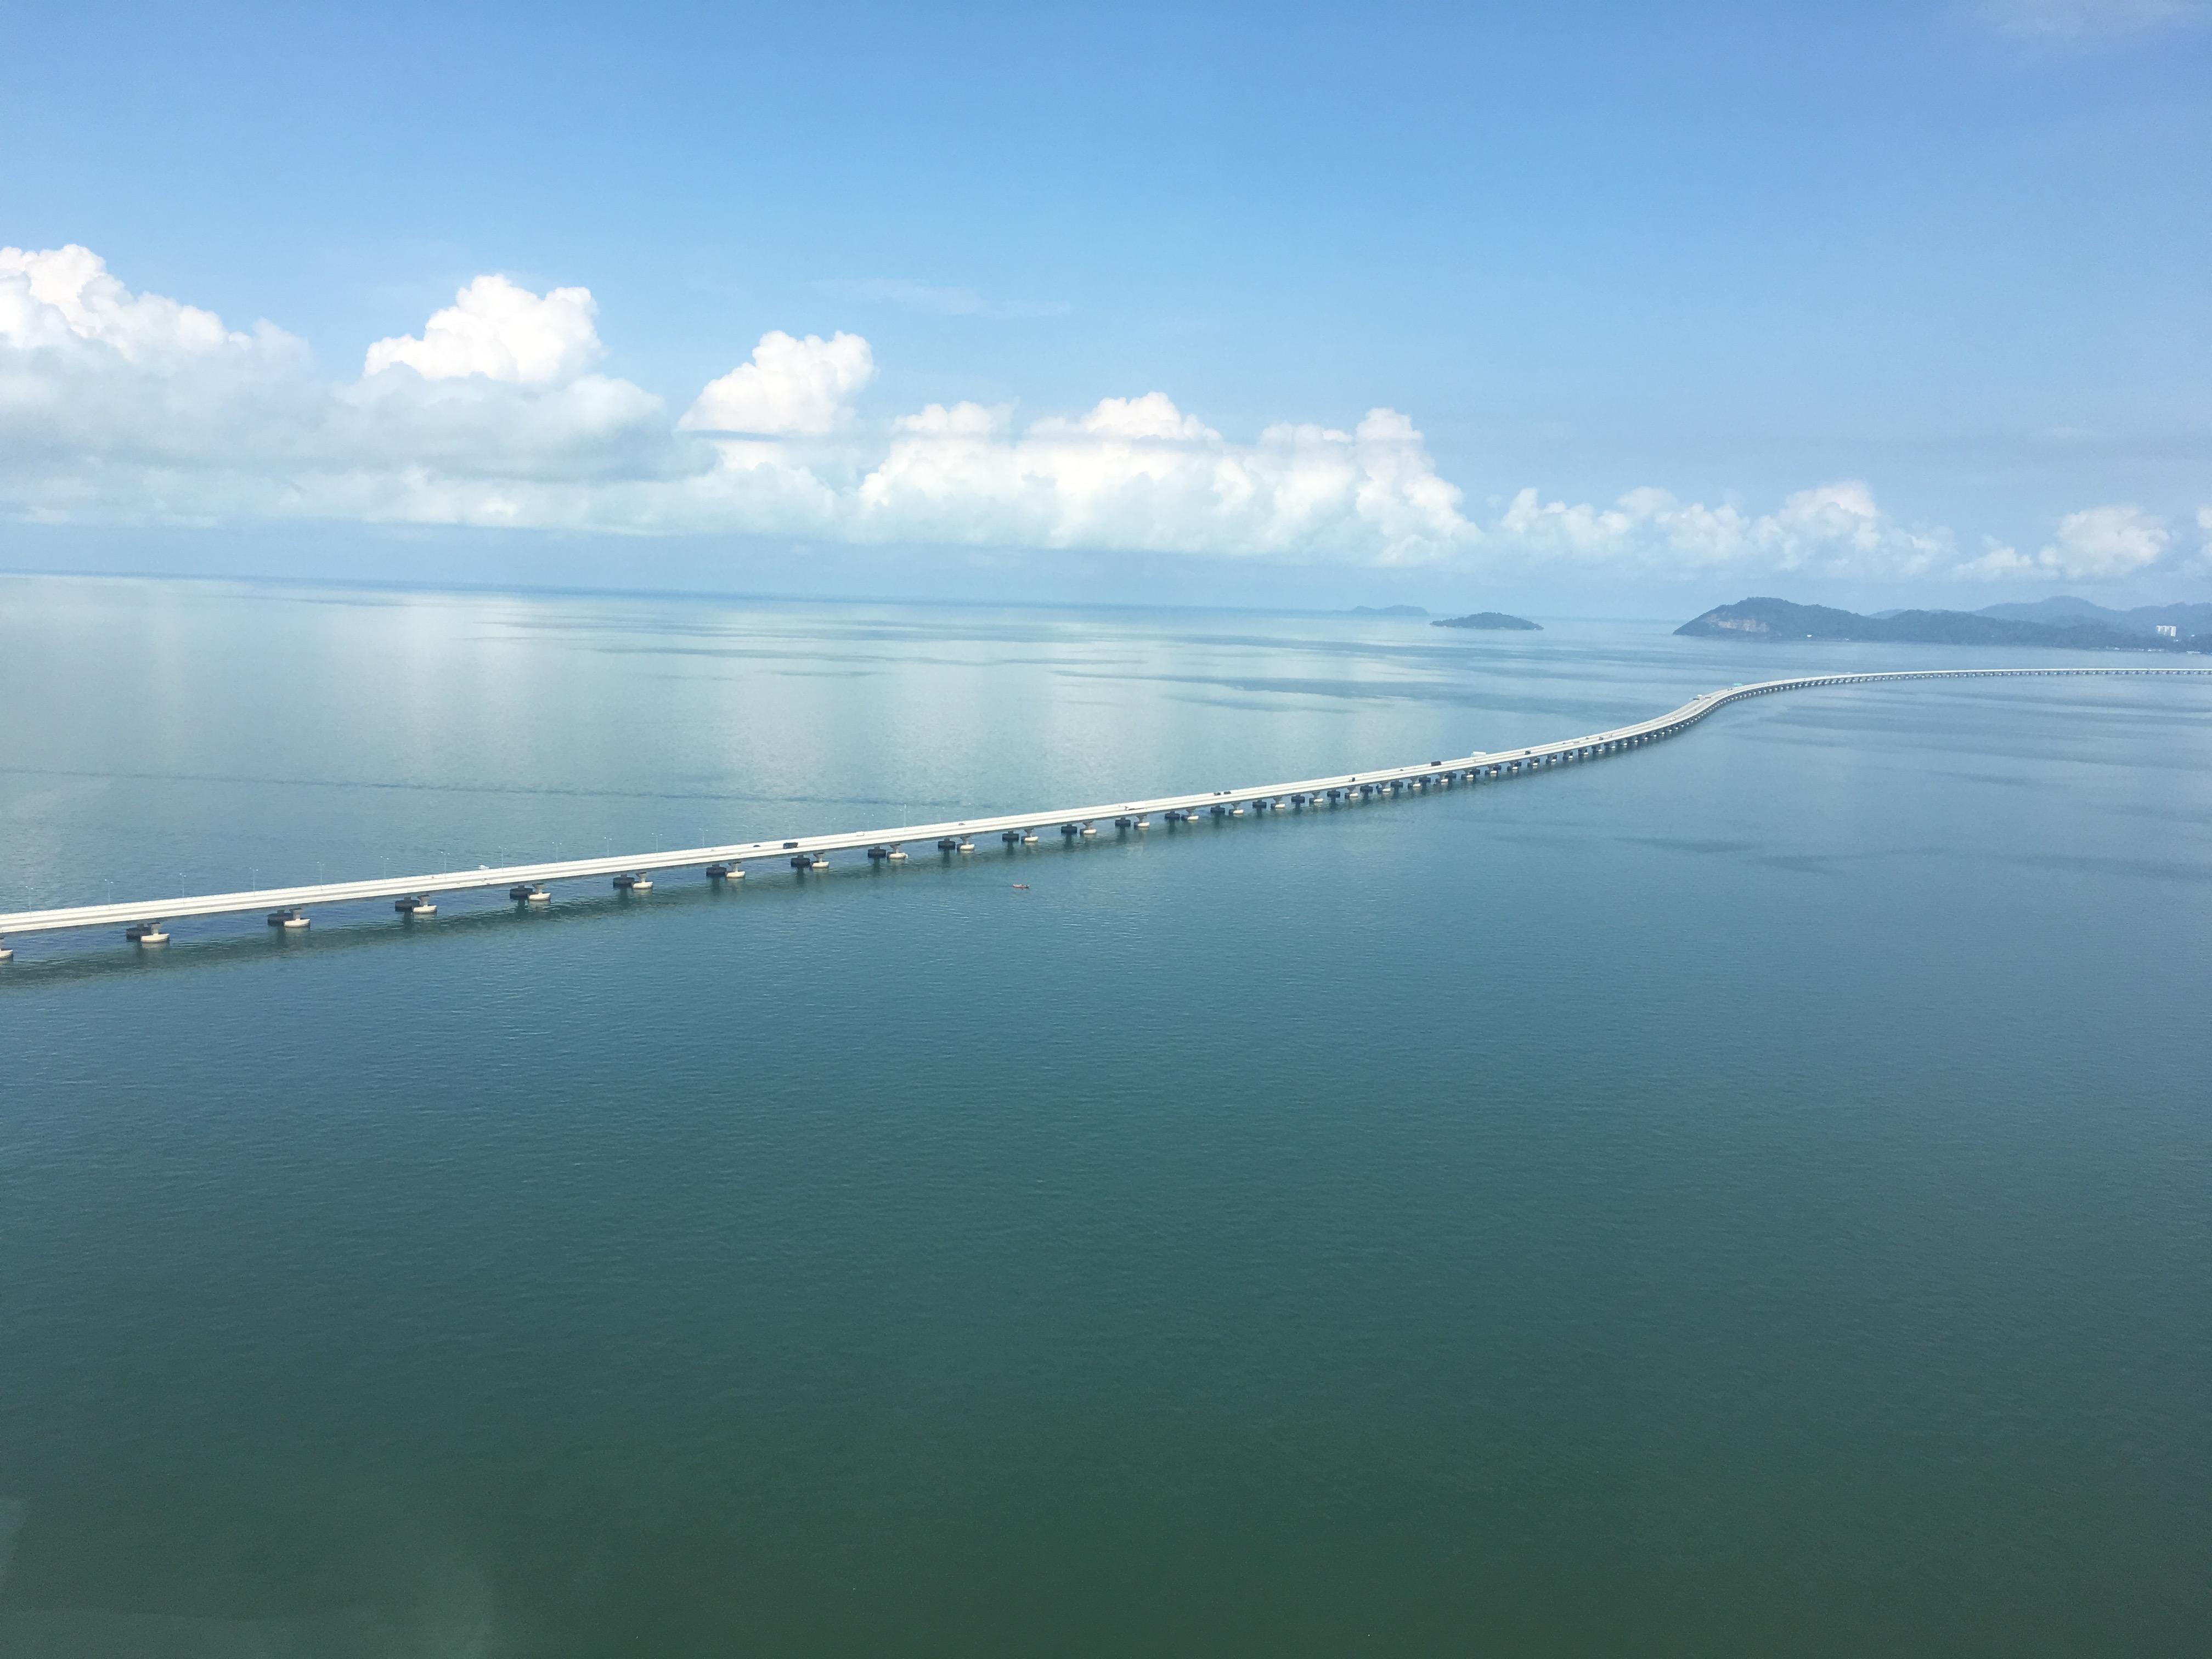 119 IMG_9727 Causeway Penang - Malaysia